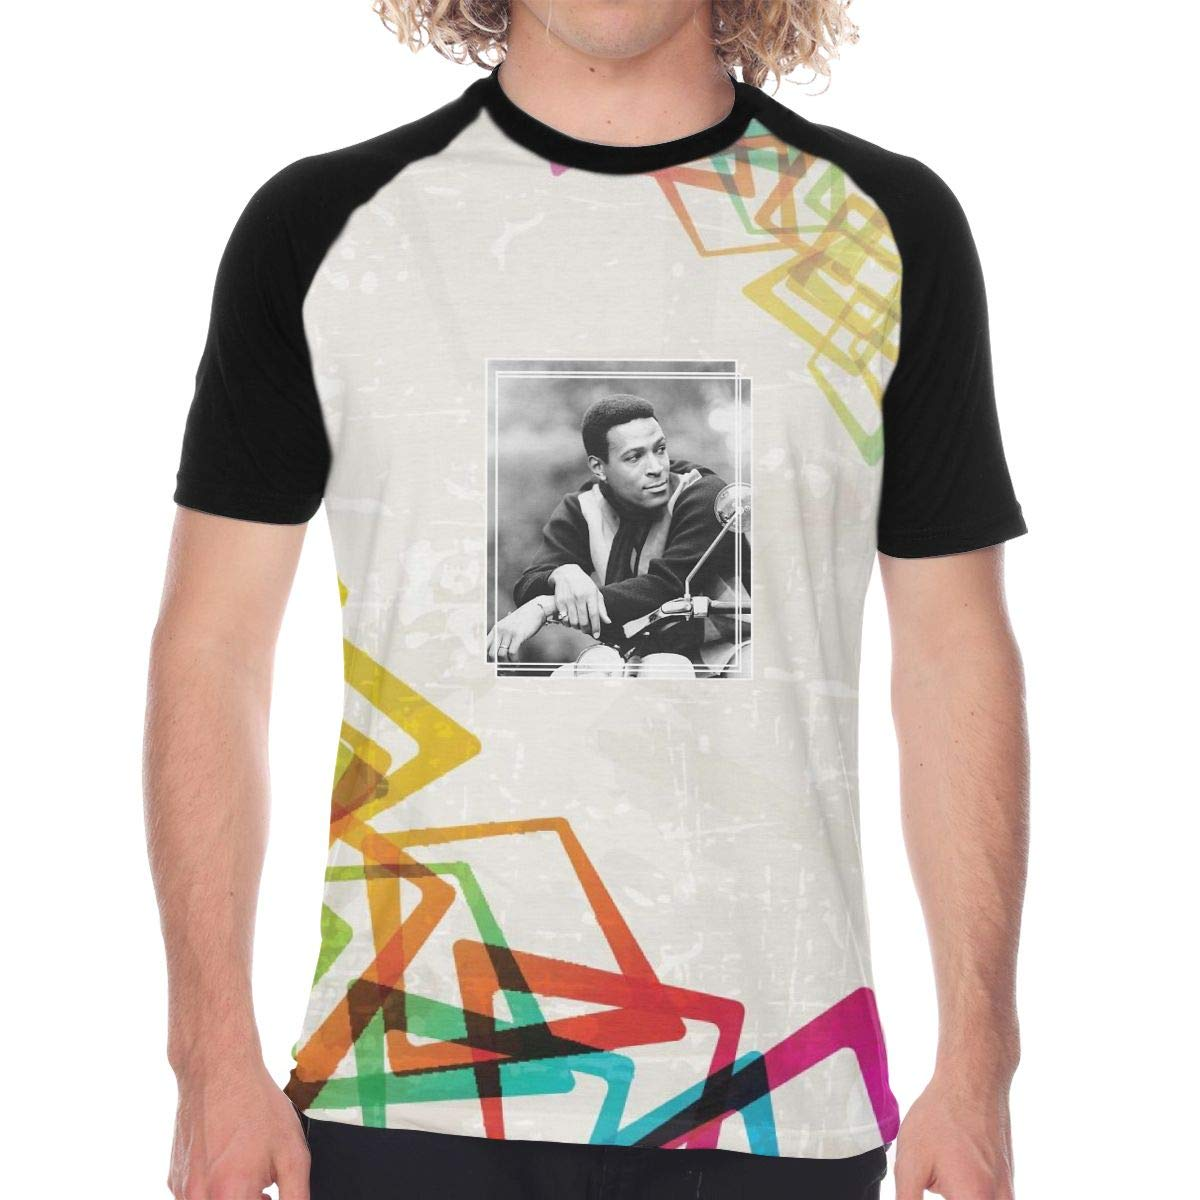 FwadGacx Marvin Gaye Men Youth Stylish Short Sleeves Full Size Printed Baseball Tee Gift